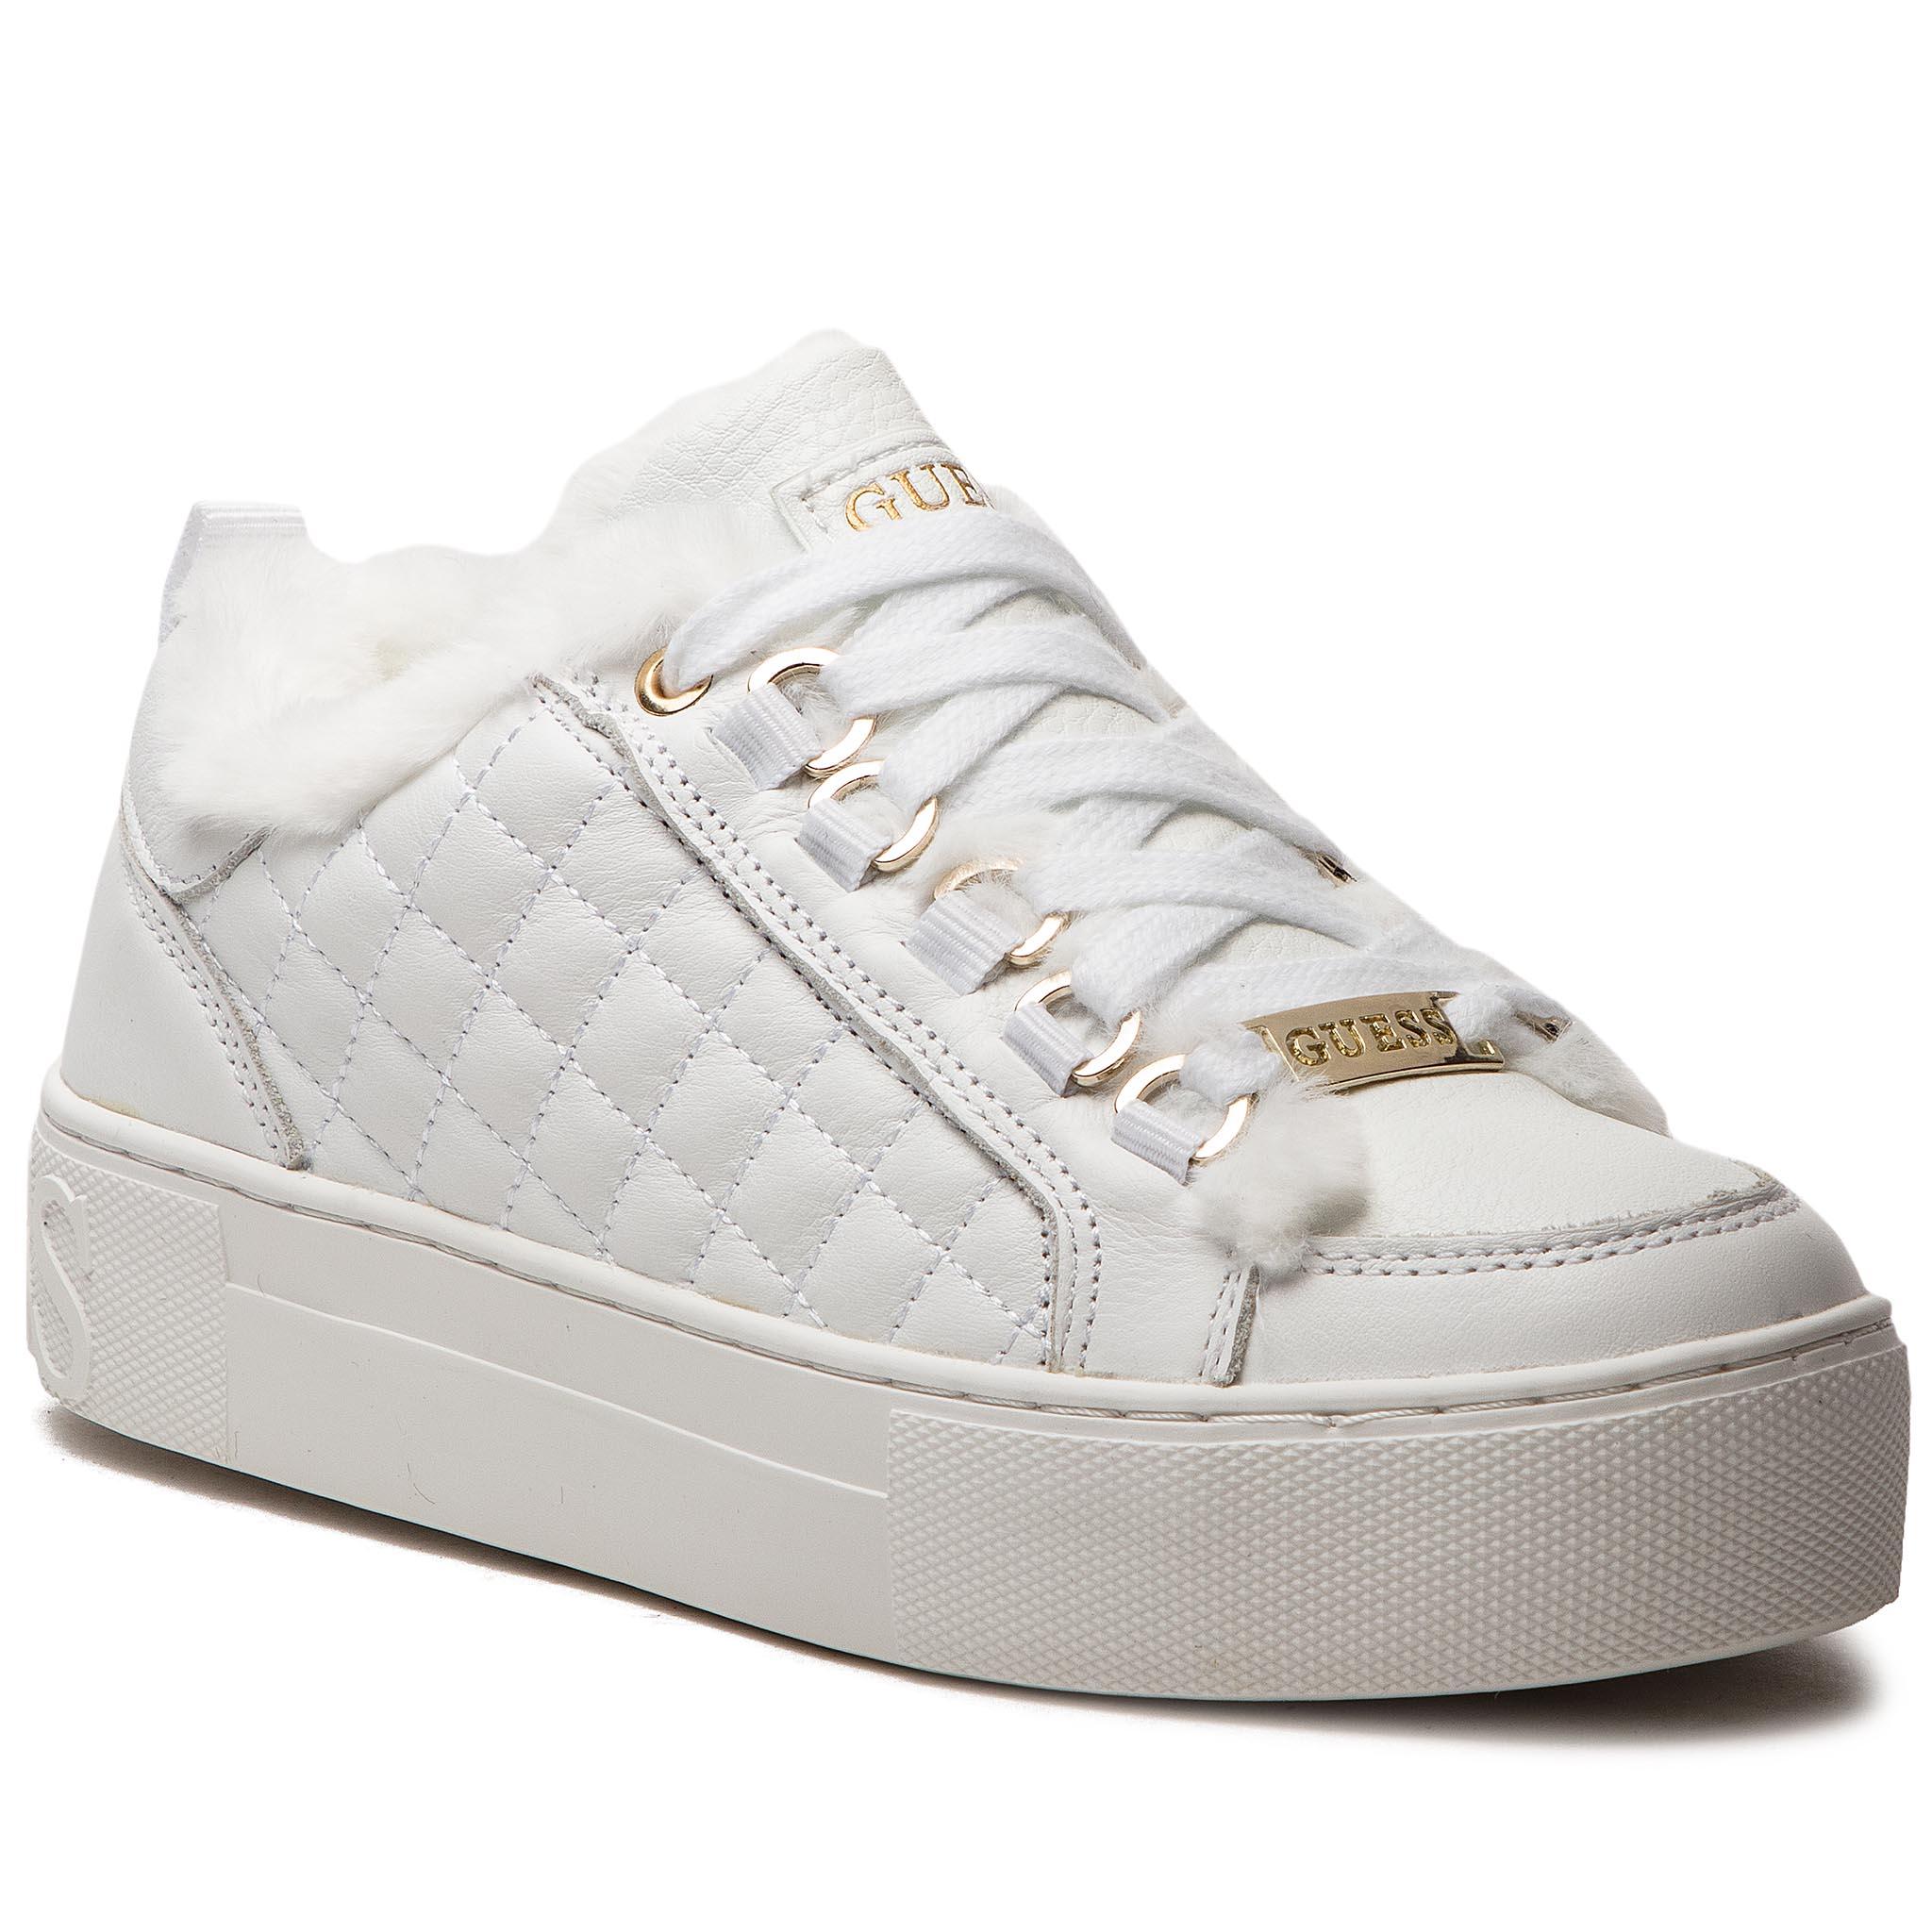 022fdbcdb2 Sneakersy GUESS - FLMET4 LEA12 WHITE - Glami.sk